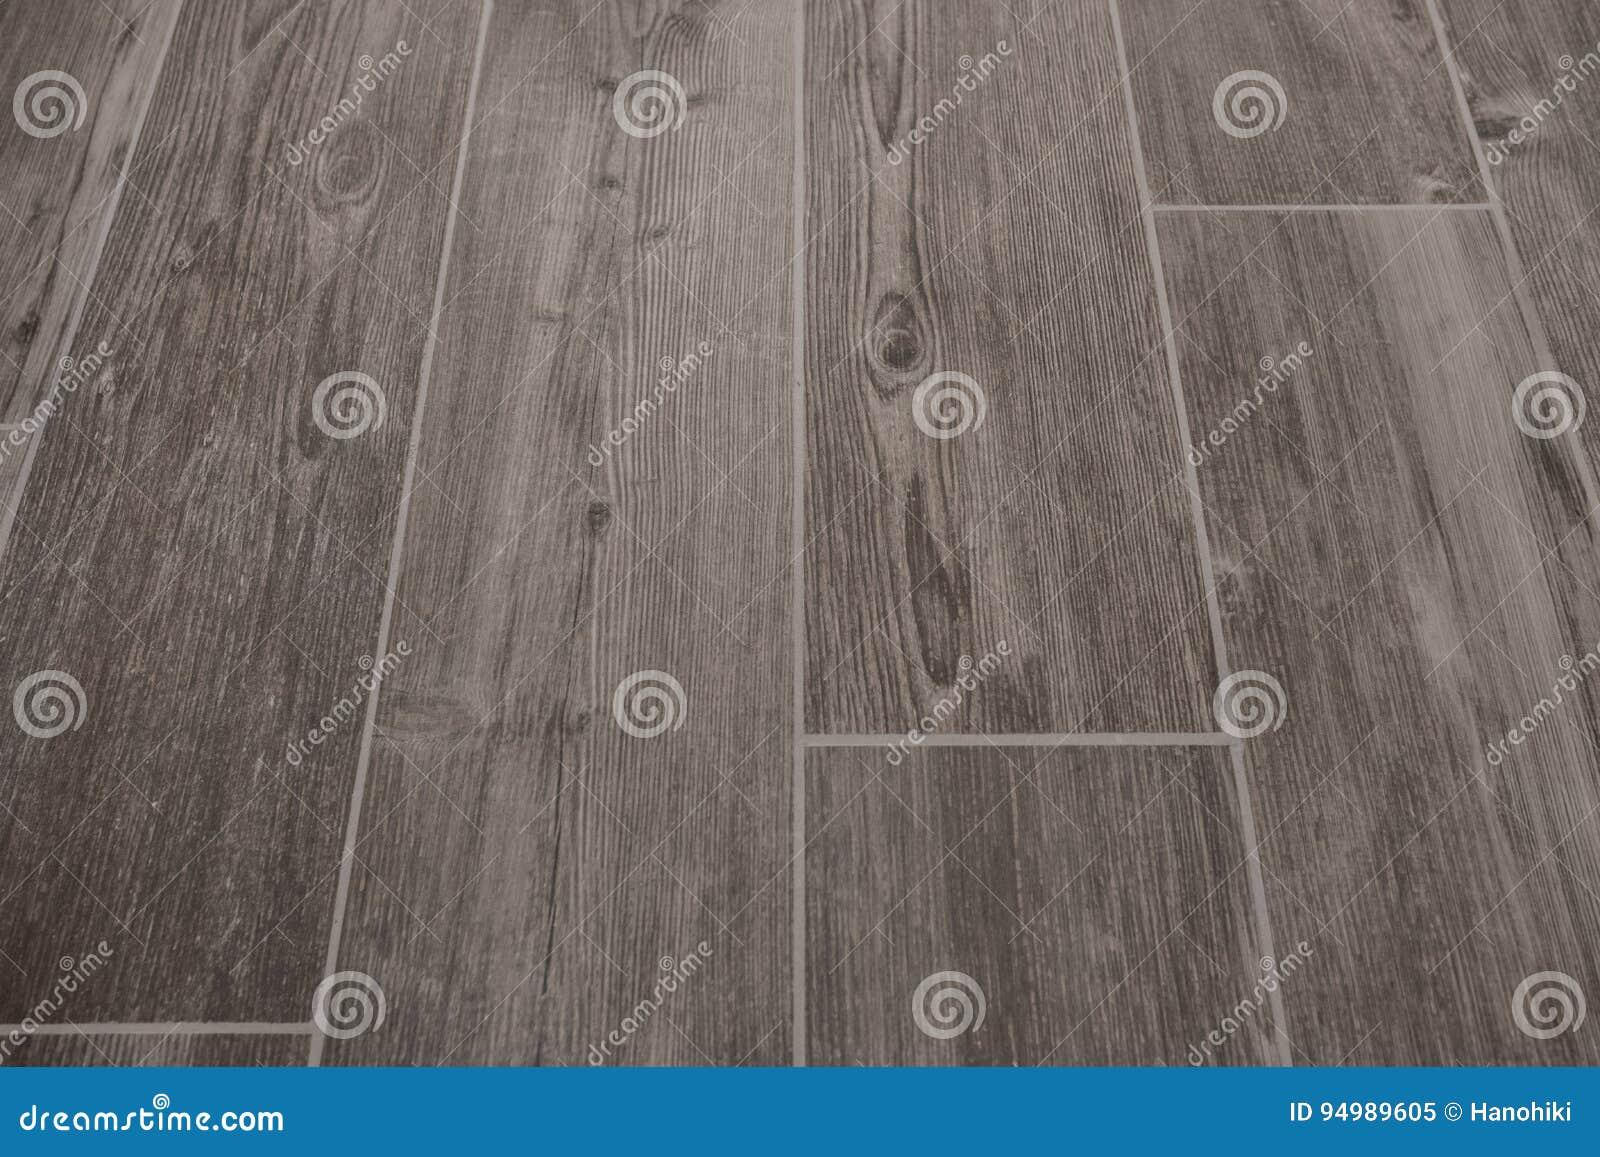 Tiles With Wooden Texture Tiled Floor Wood Design Stock Image